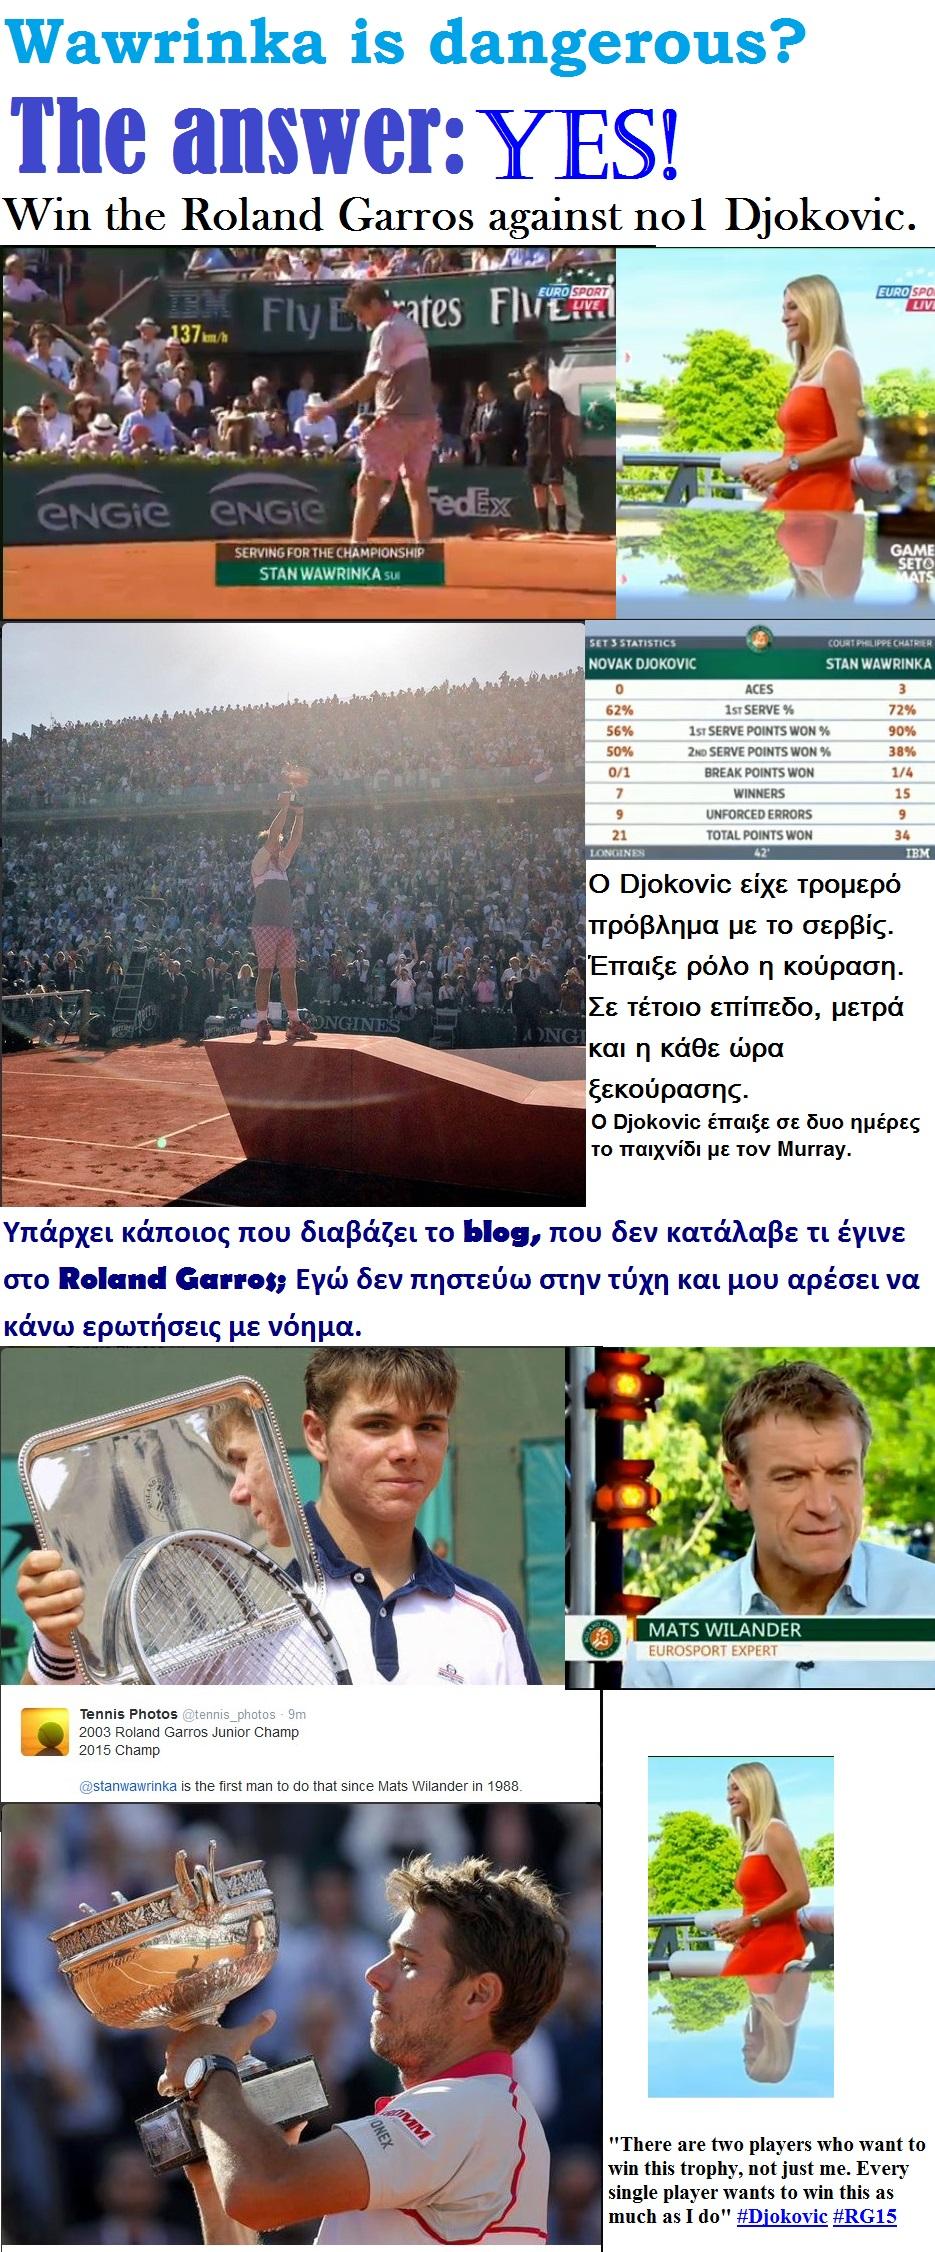 TENNIS GRAND SLAM ROLAND GARROS DJOKOVIC VS WAWRINKA WIN FINAL 01 070615